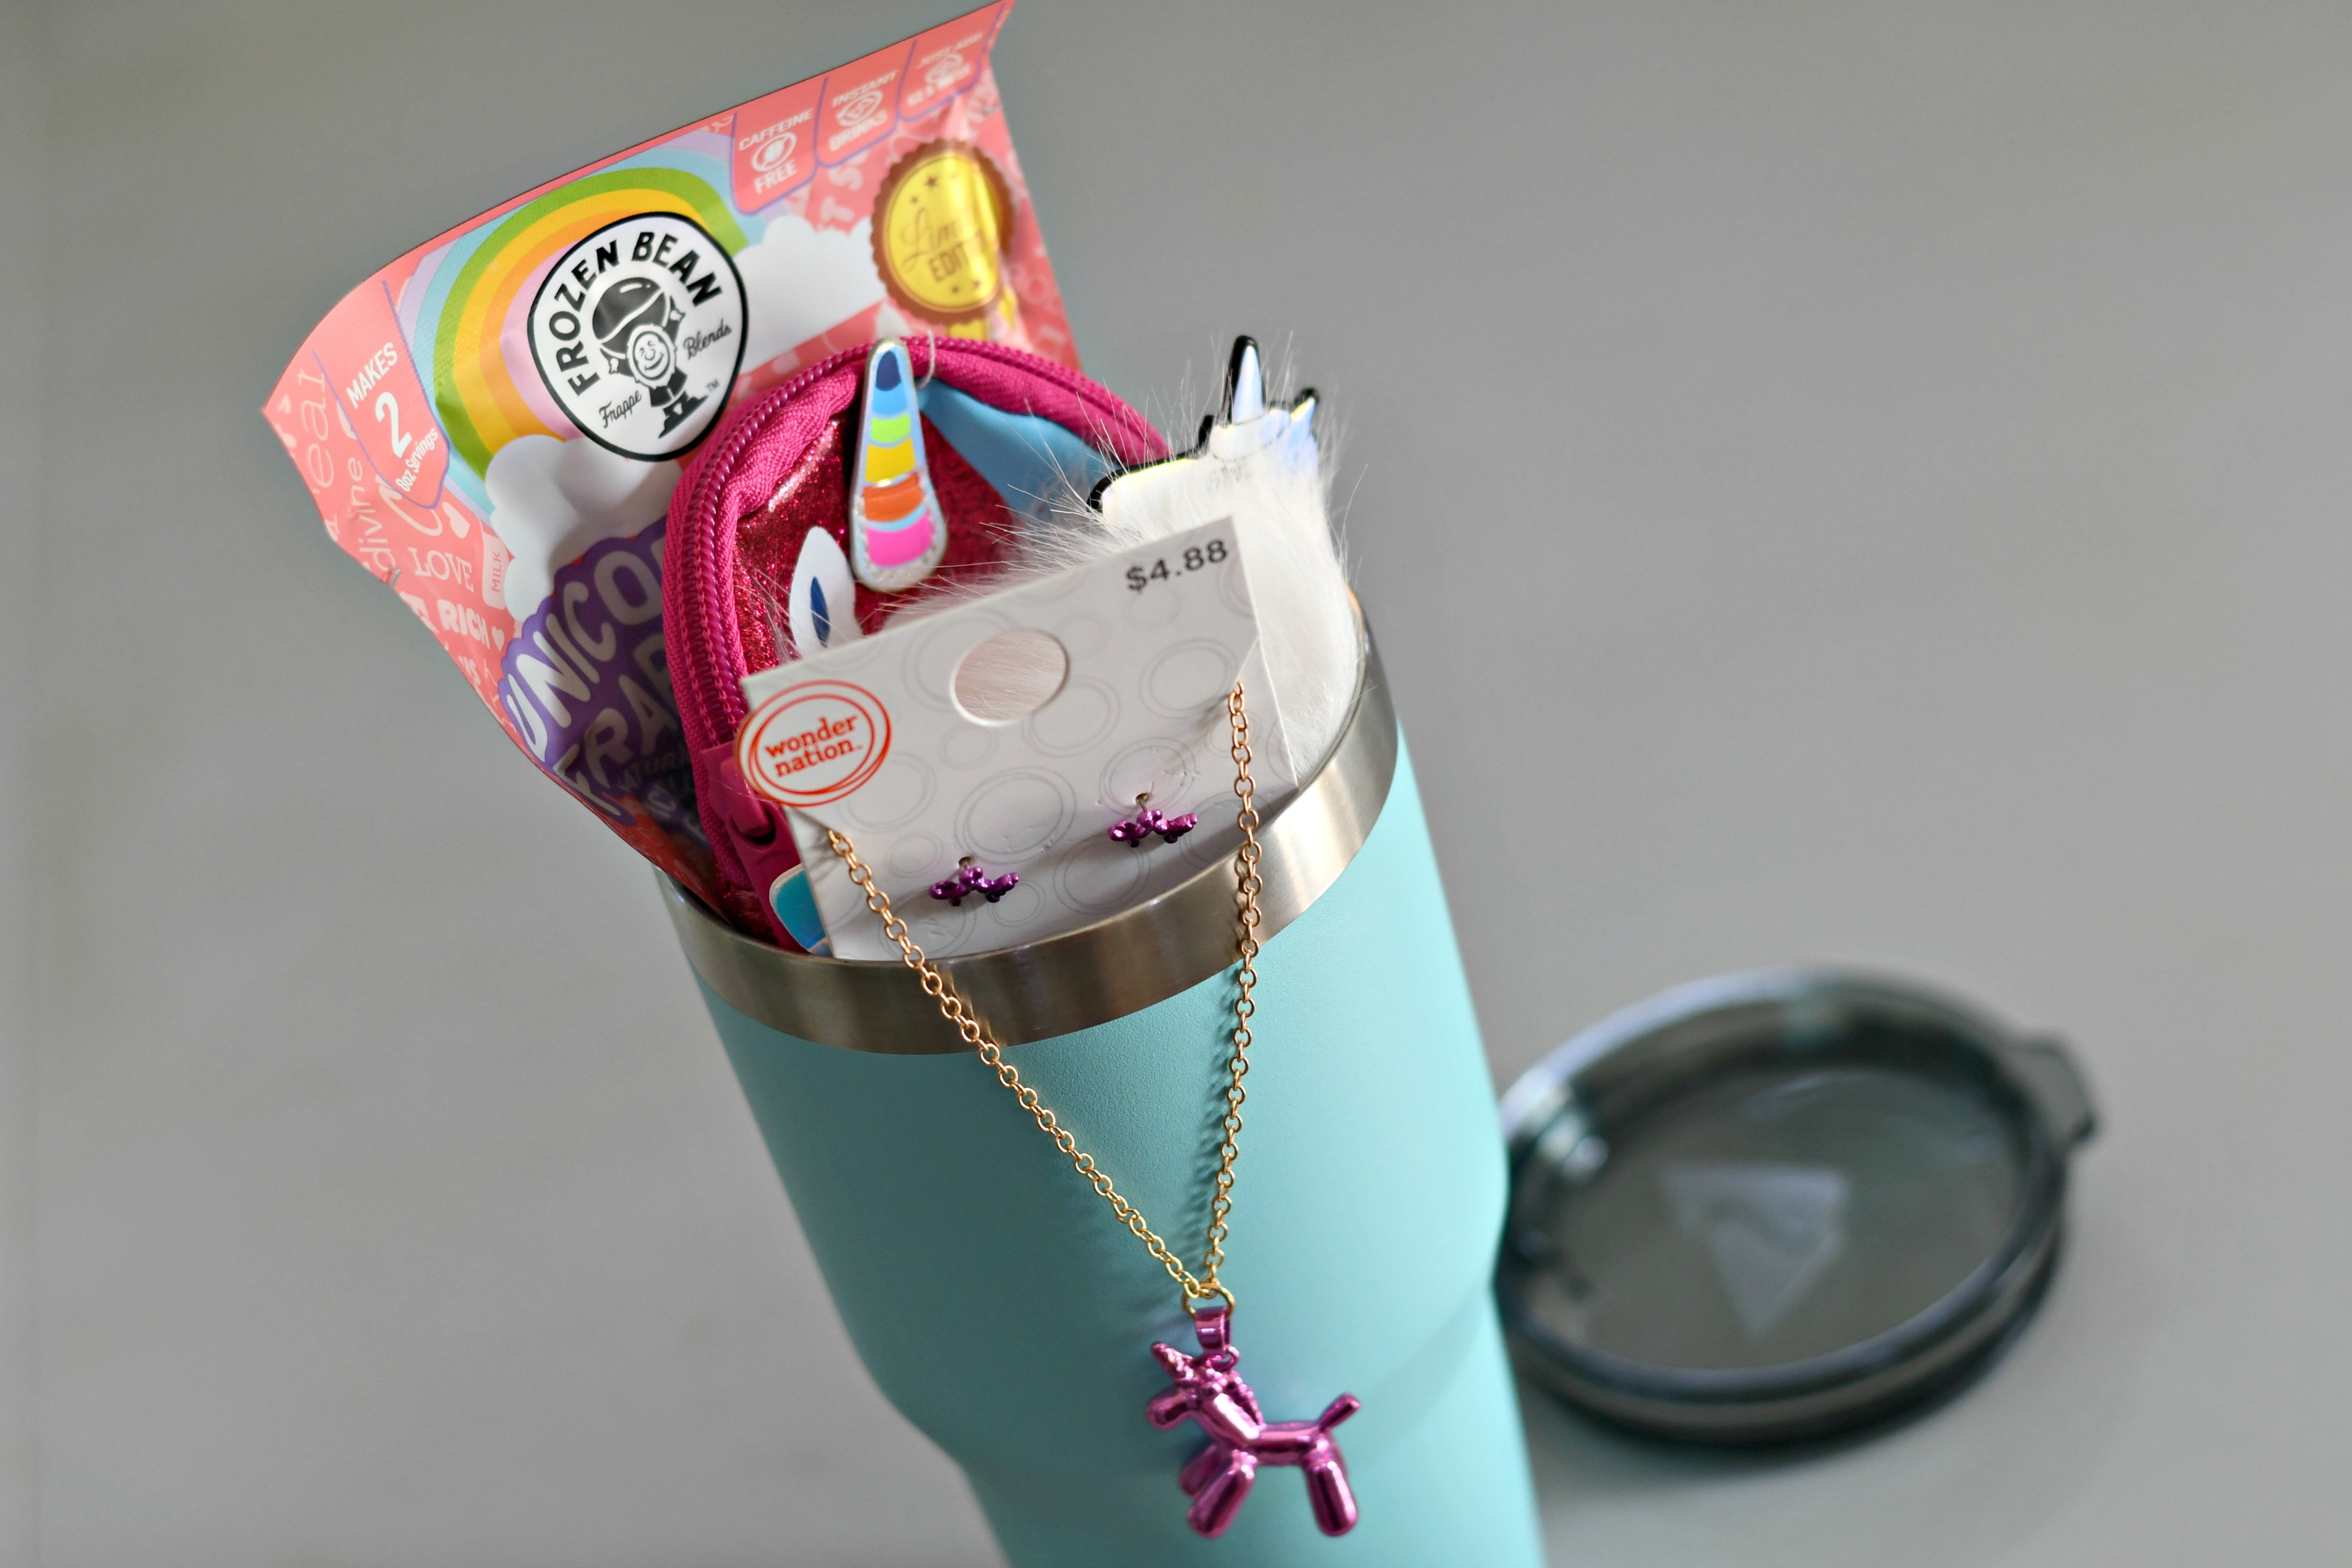 DIY Tumbler Gift basket ideas – Unicorn gift contents in the tumbler